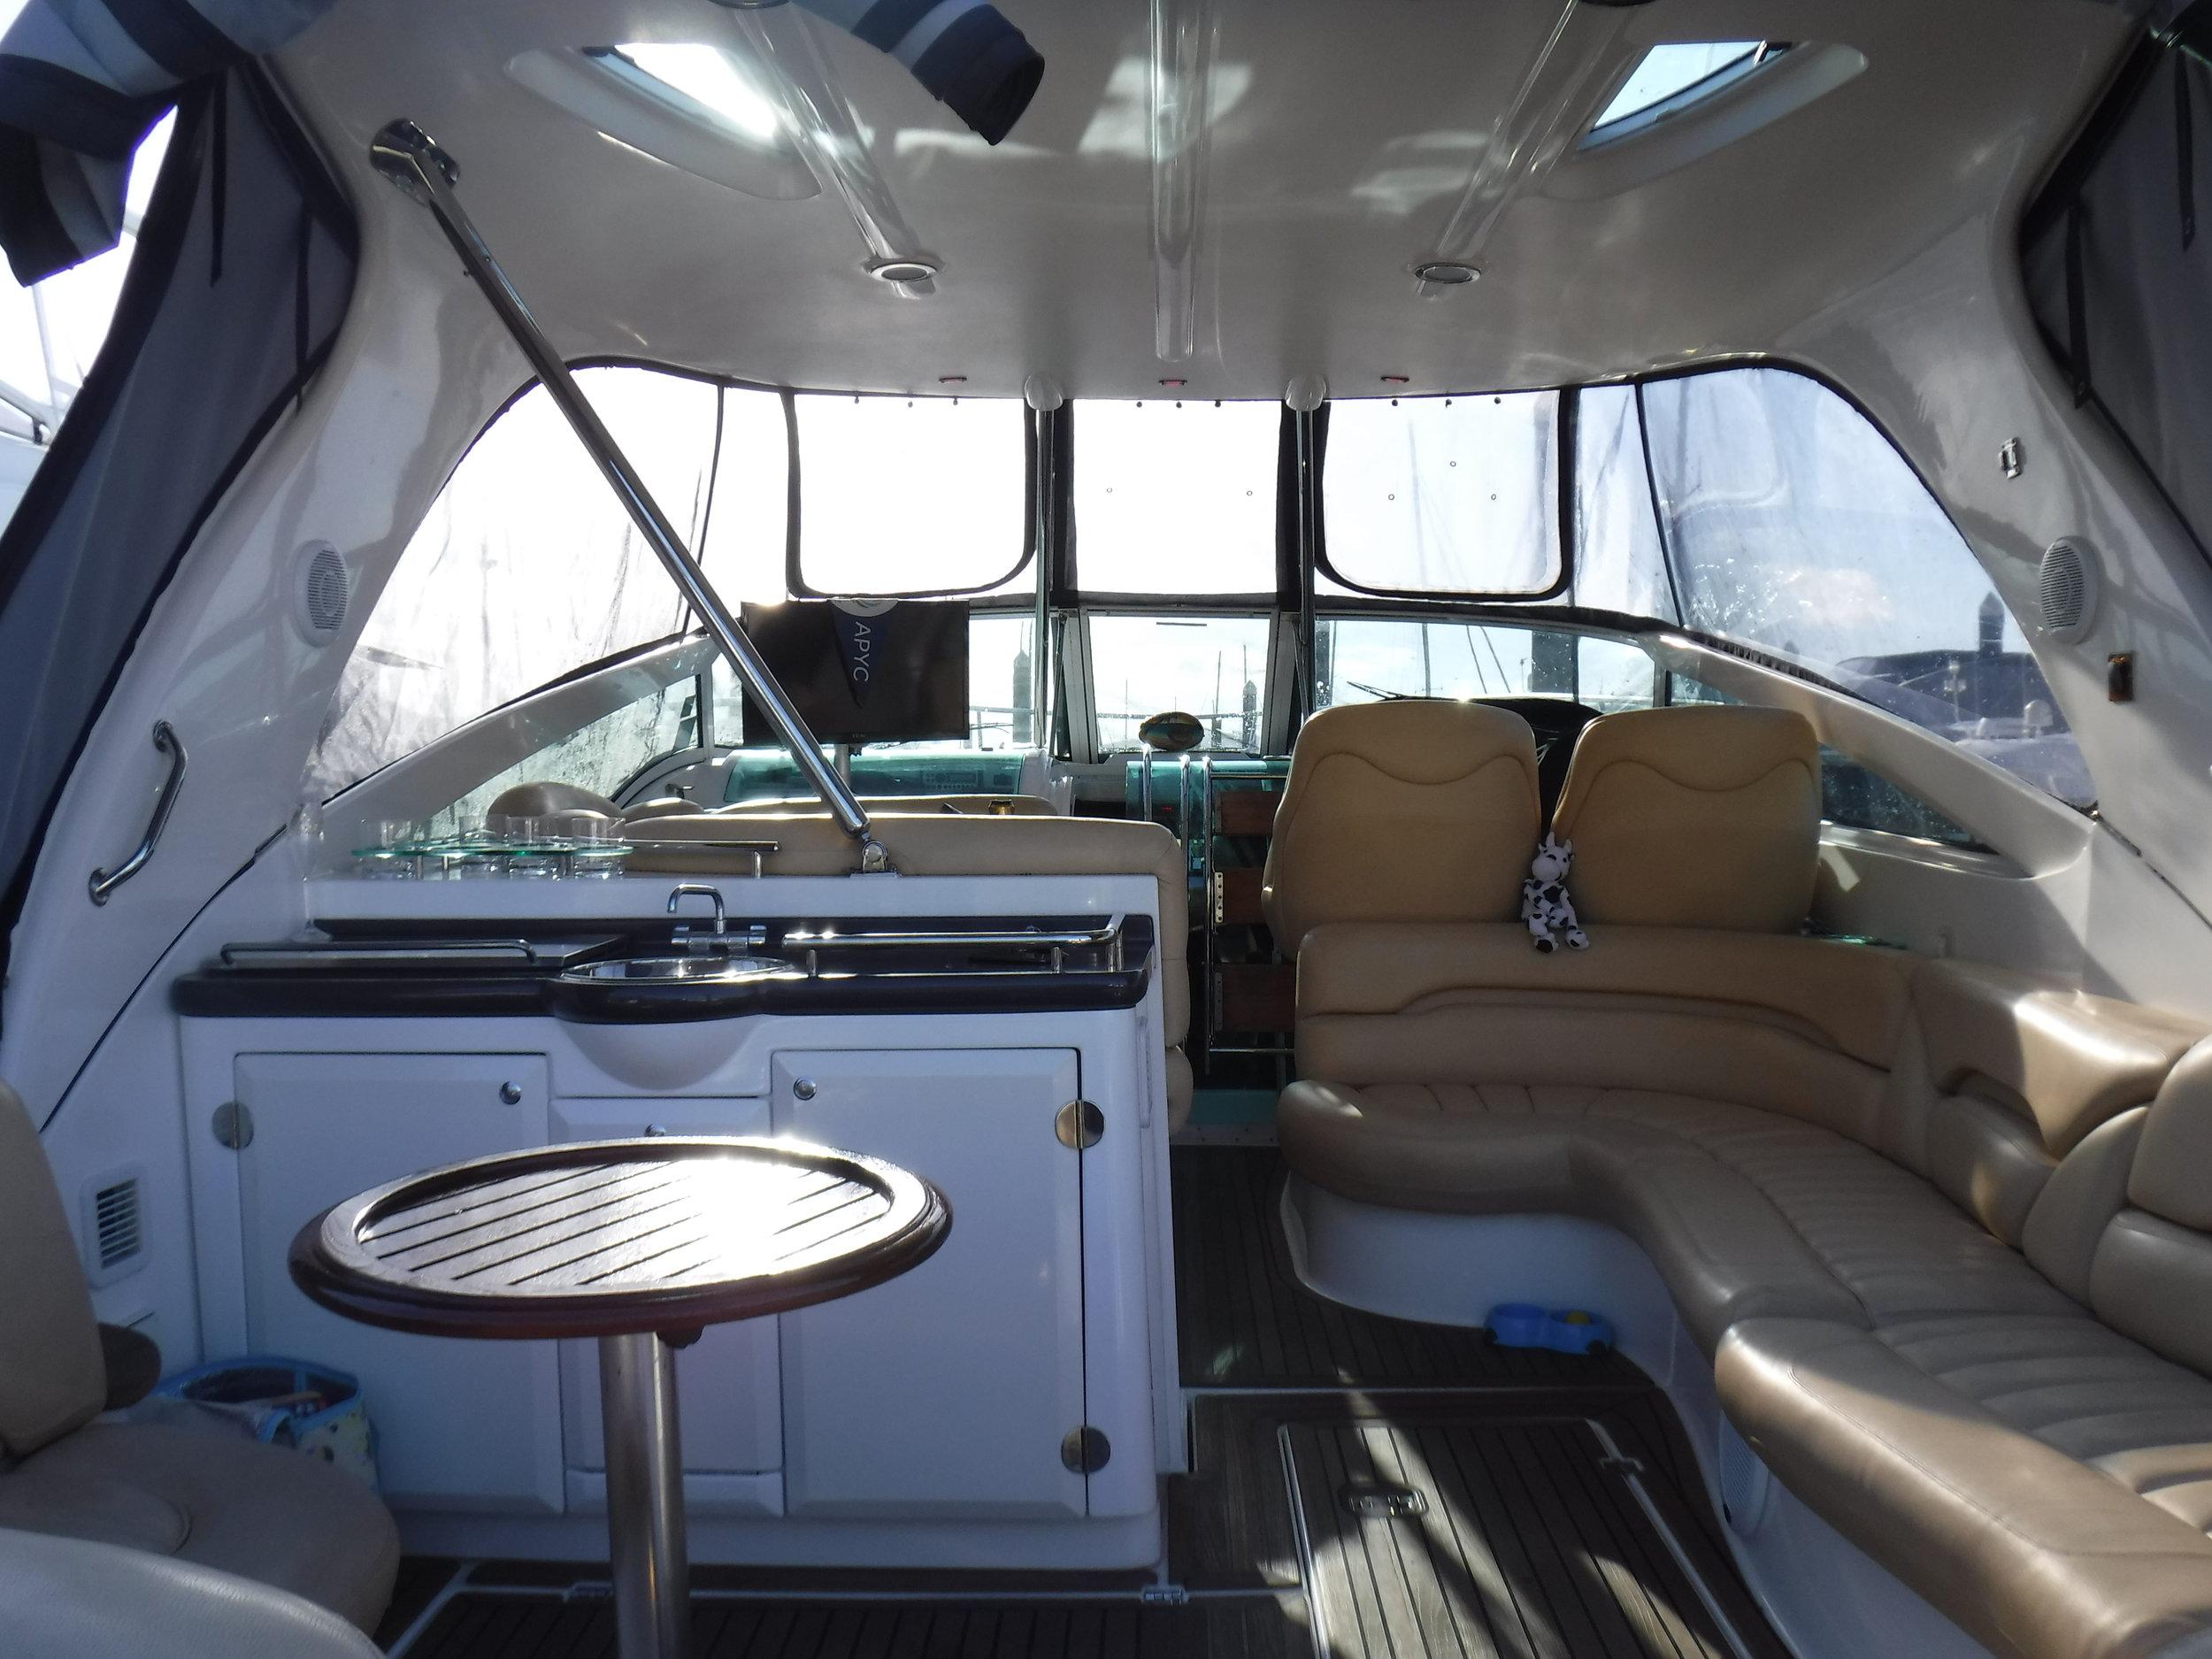 bonefish and new boats 362.JPG